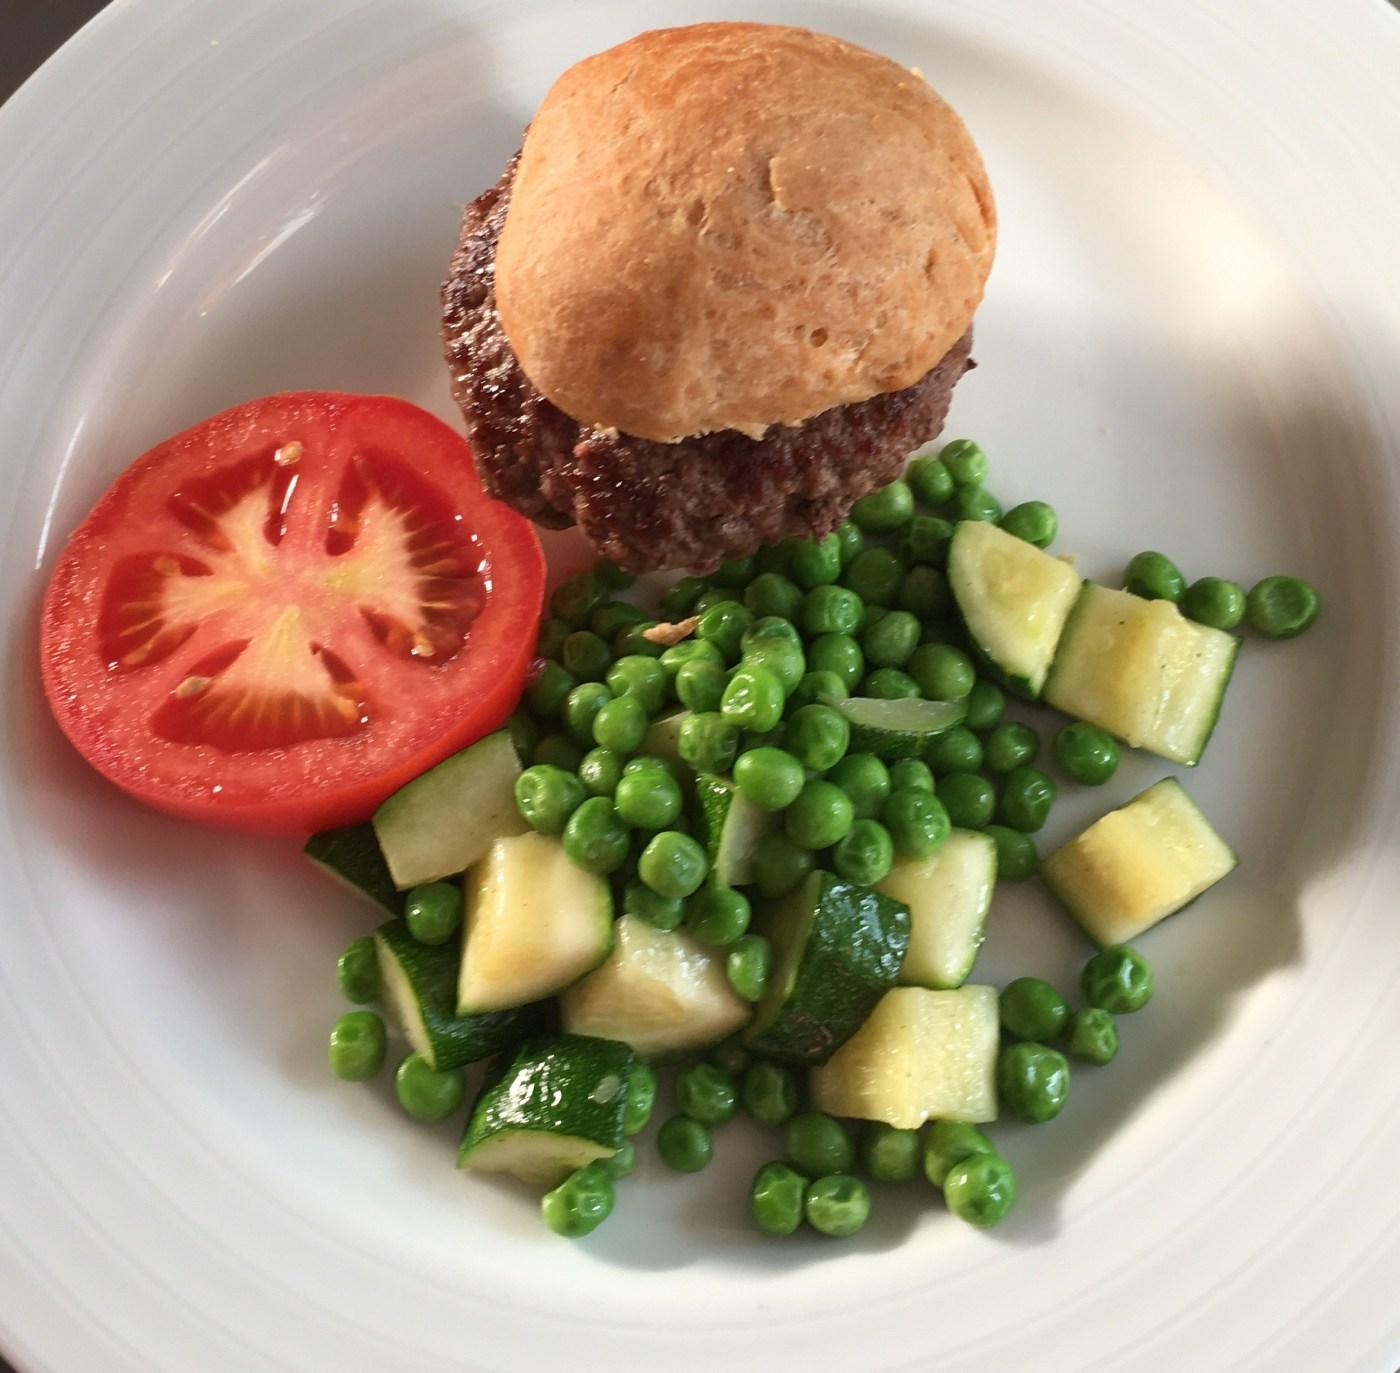 Beef burger on a wheat bun with Zucchini & Pea Salad